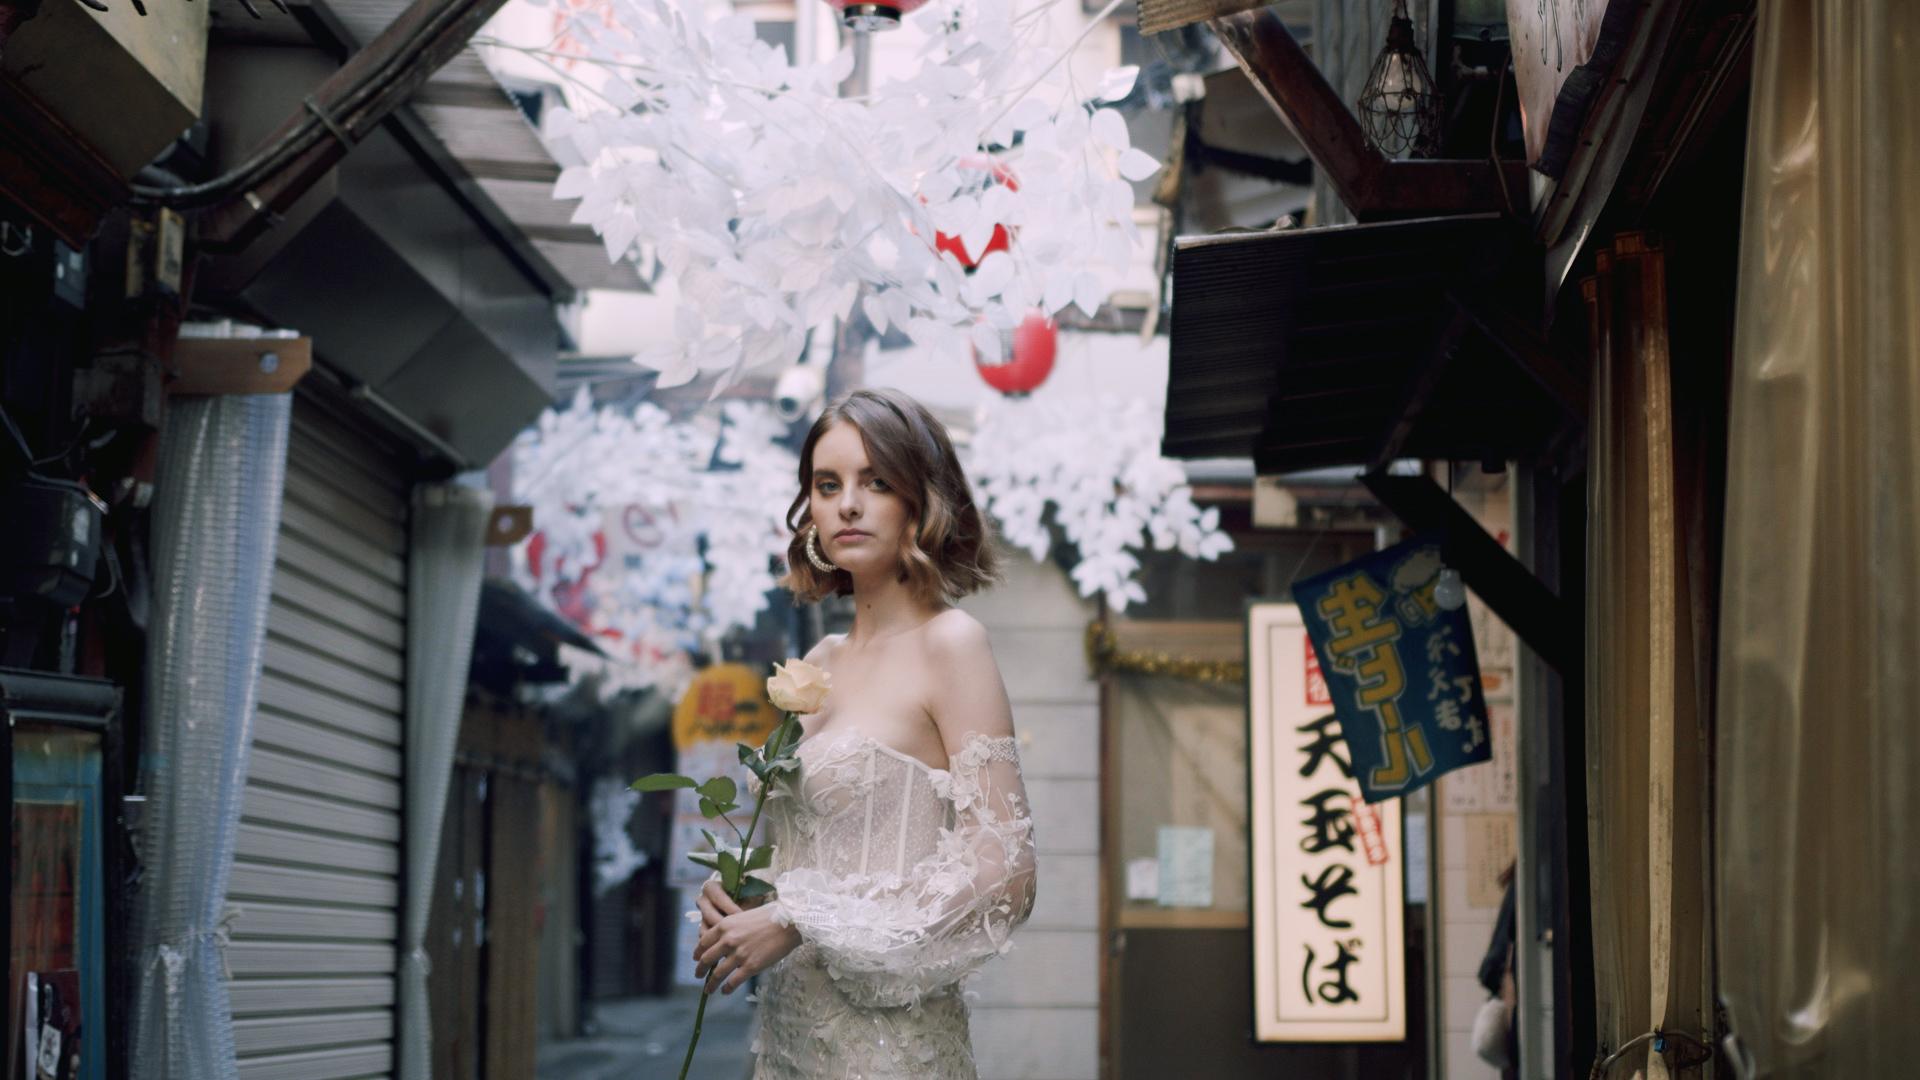 Cherie by Oui Melbourne Wedding Dresses